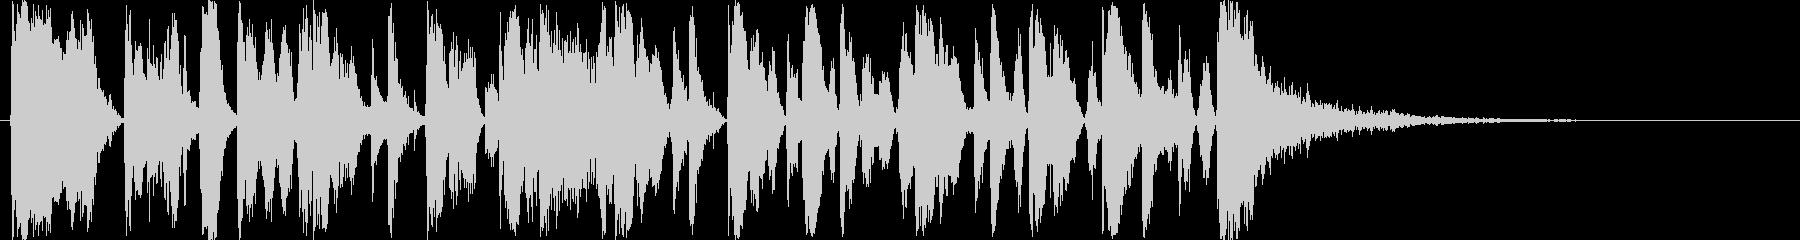 Brass Funk 15秒CMの未再生の波形